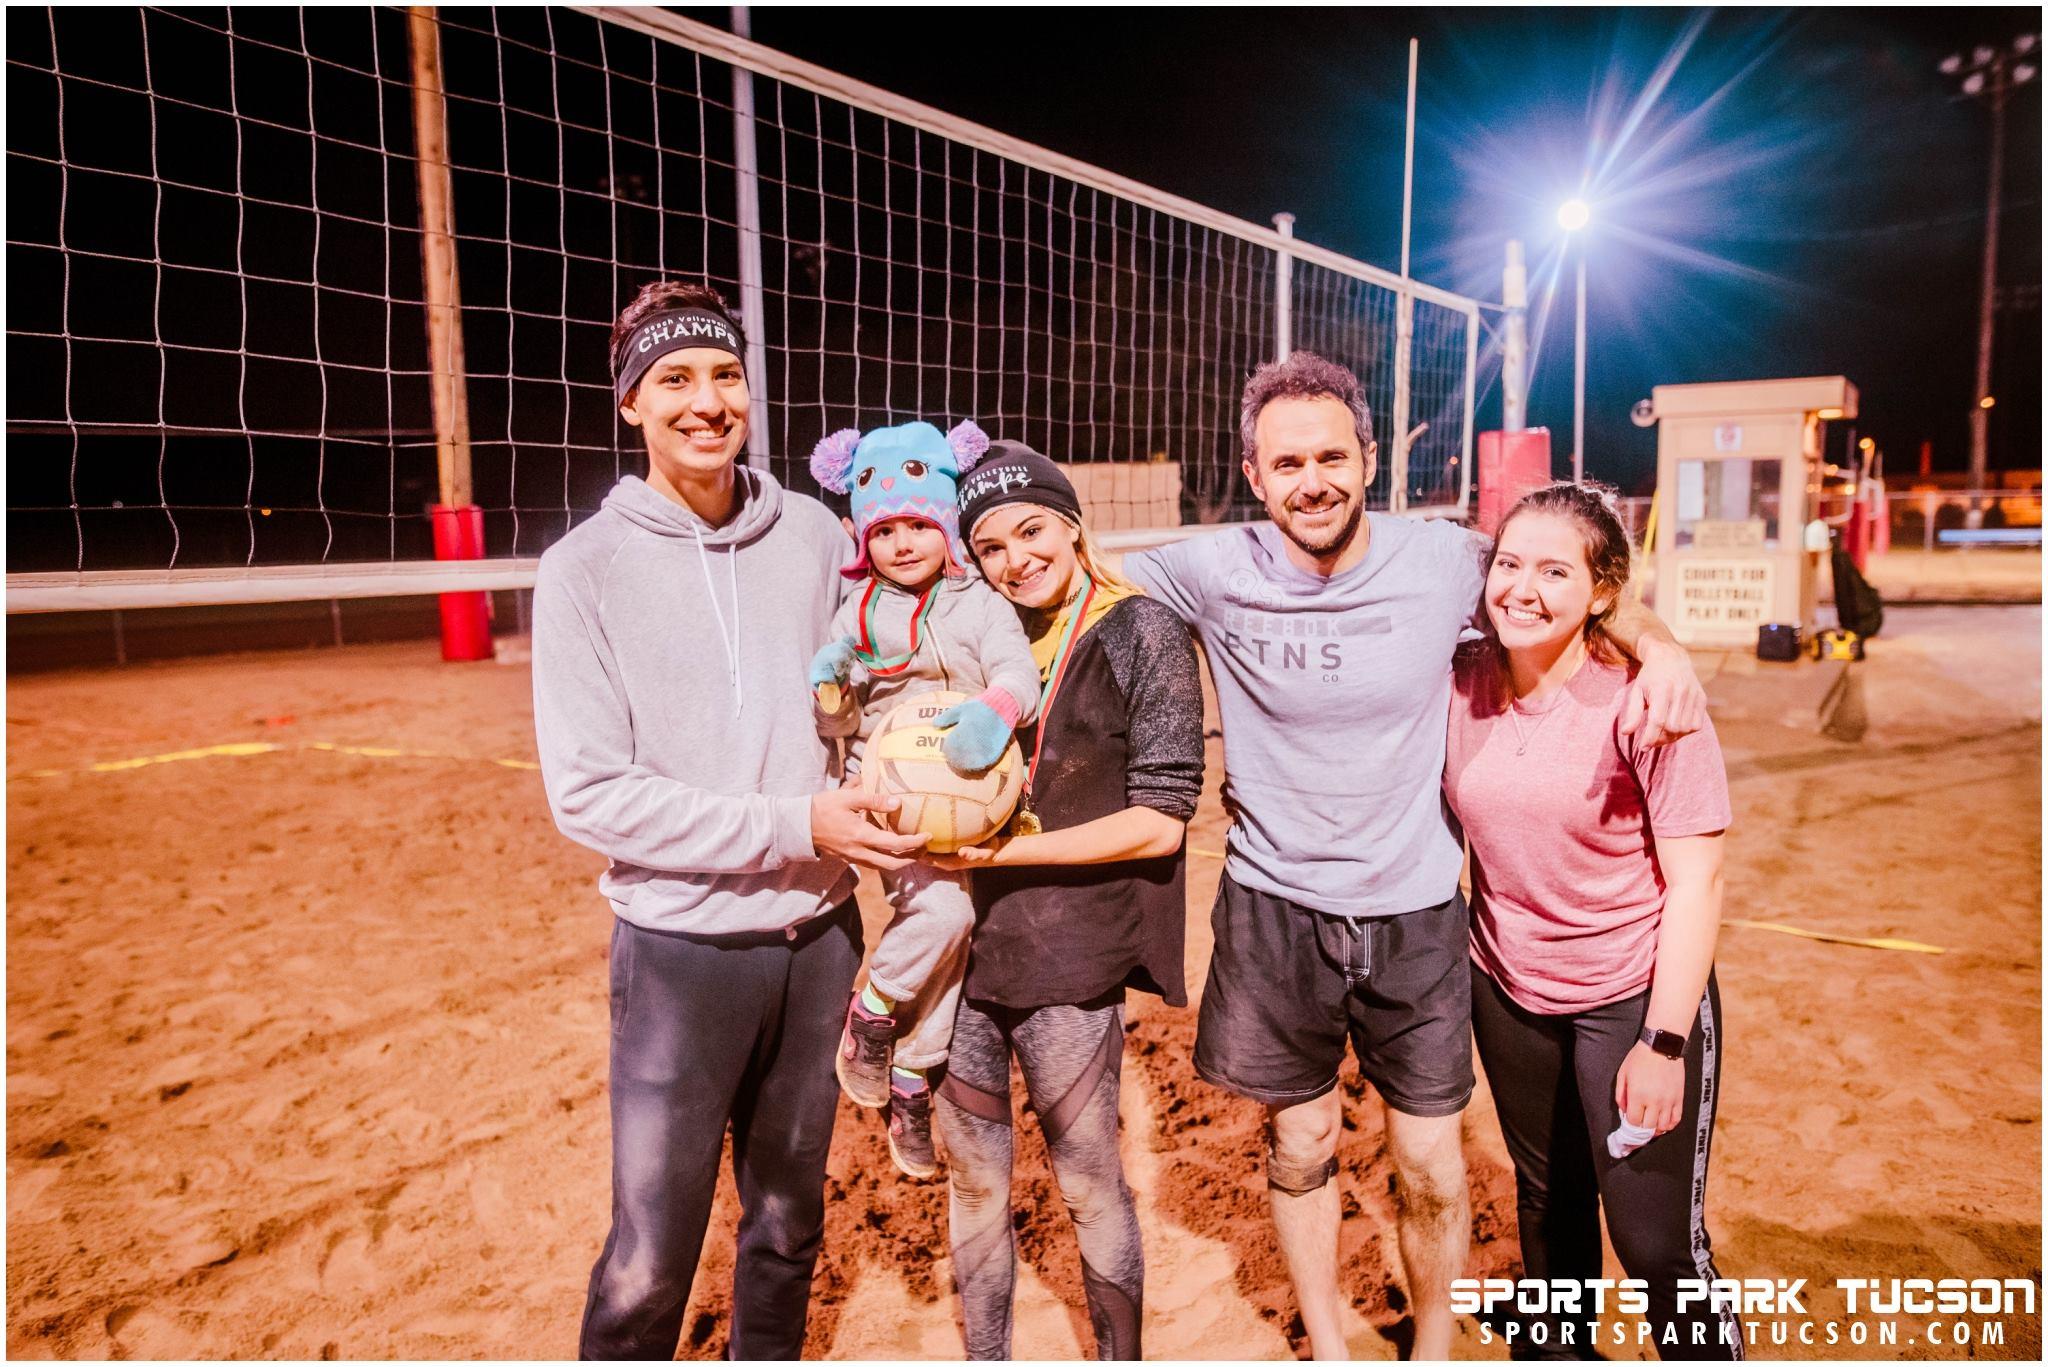 Volleyball Sun Co-ed 2 v 2 - Mix Champions